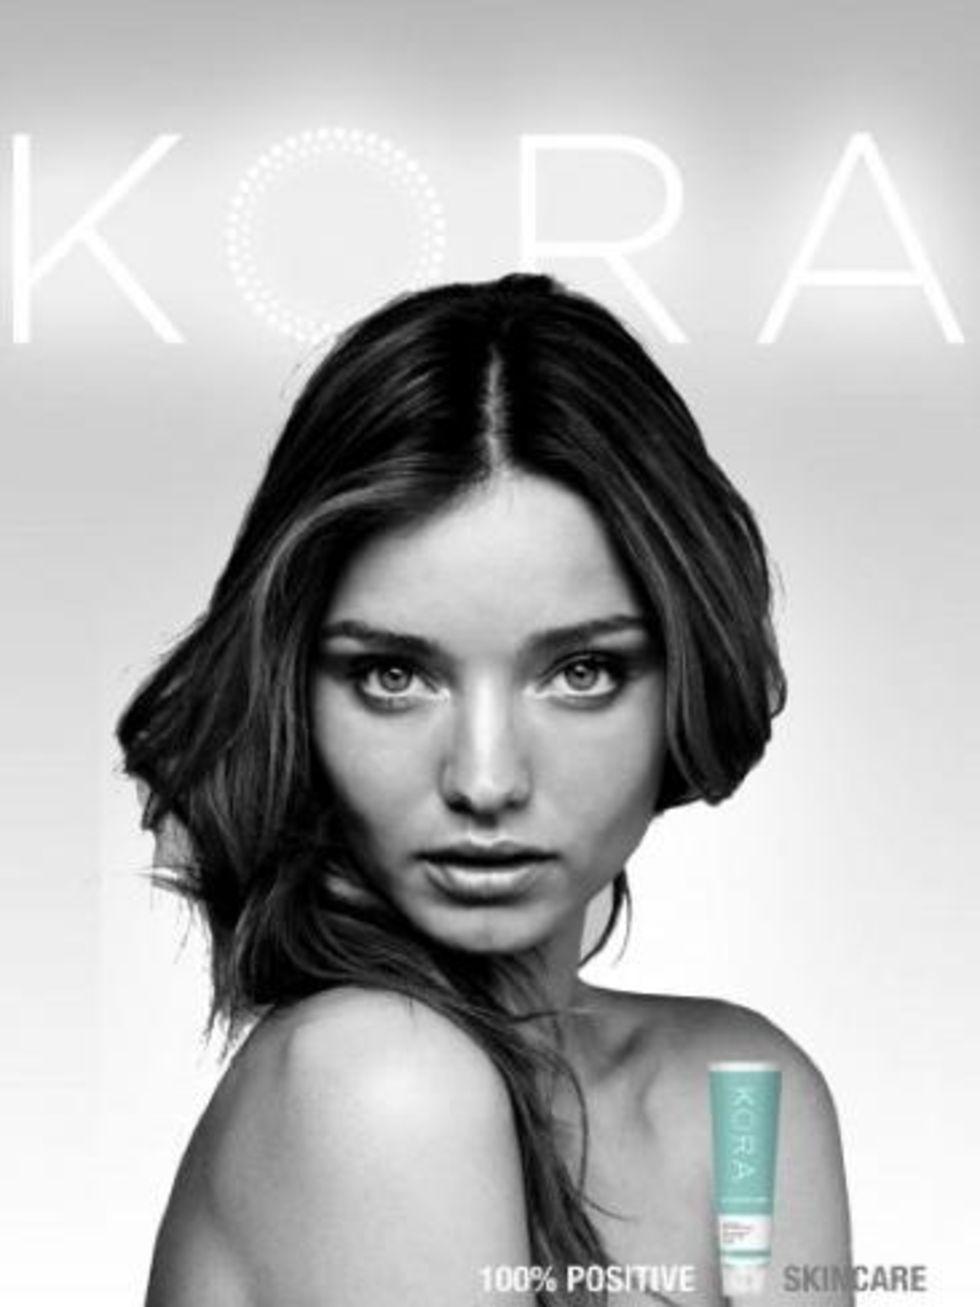 miranda-kerr-kora-skincare-advert-01